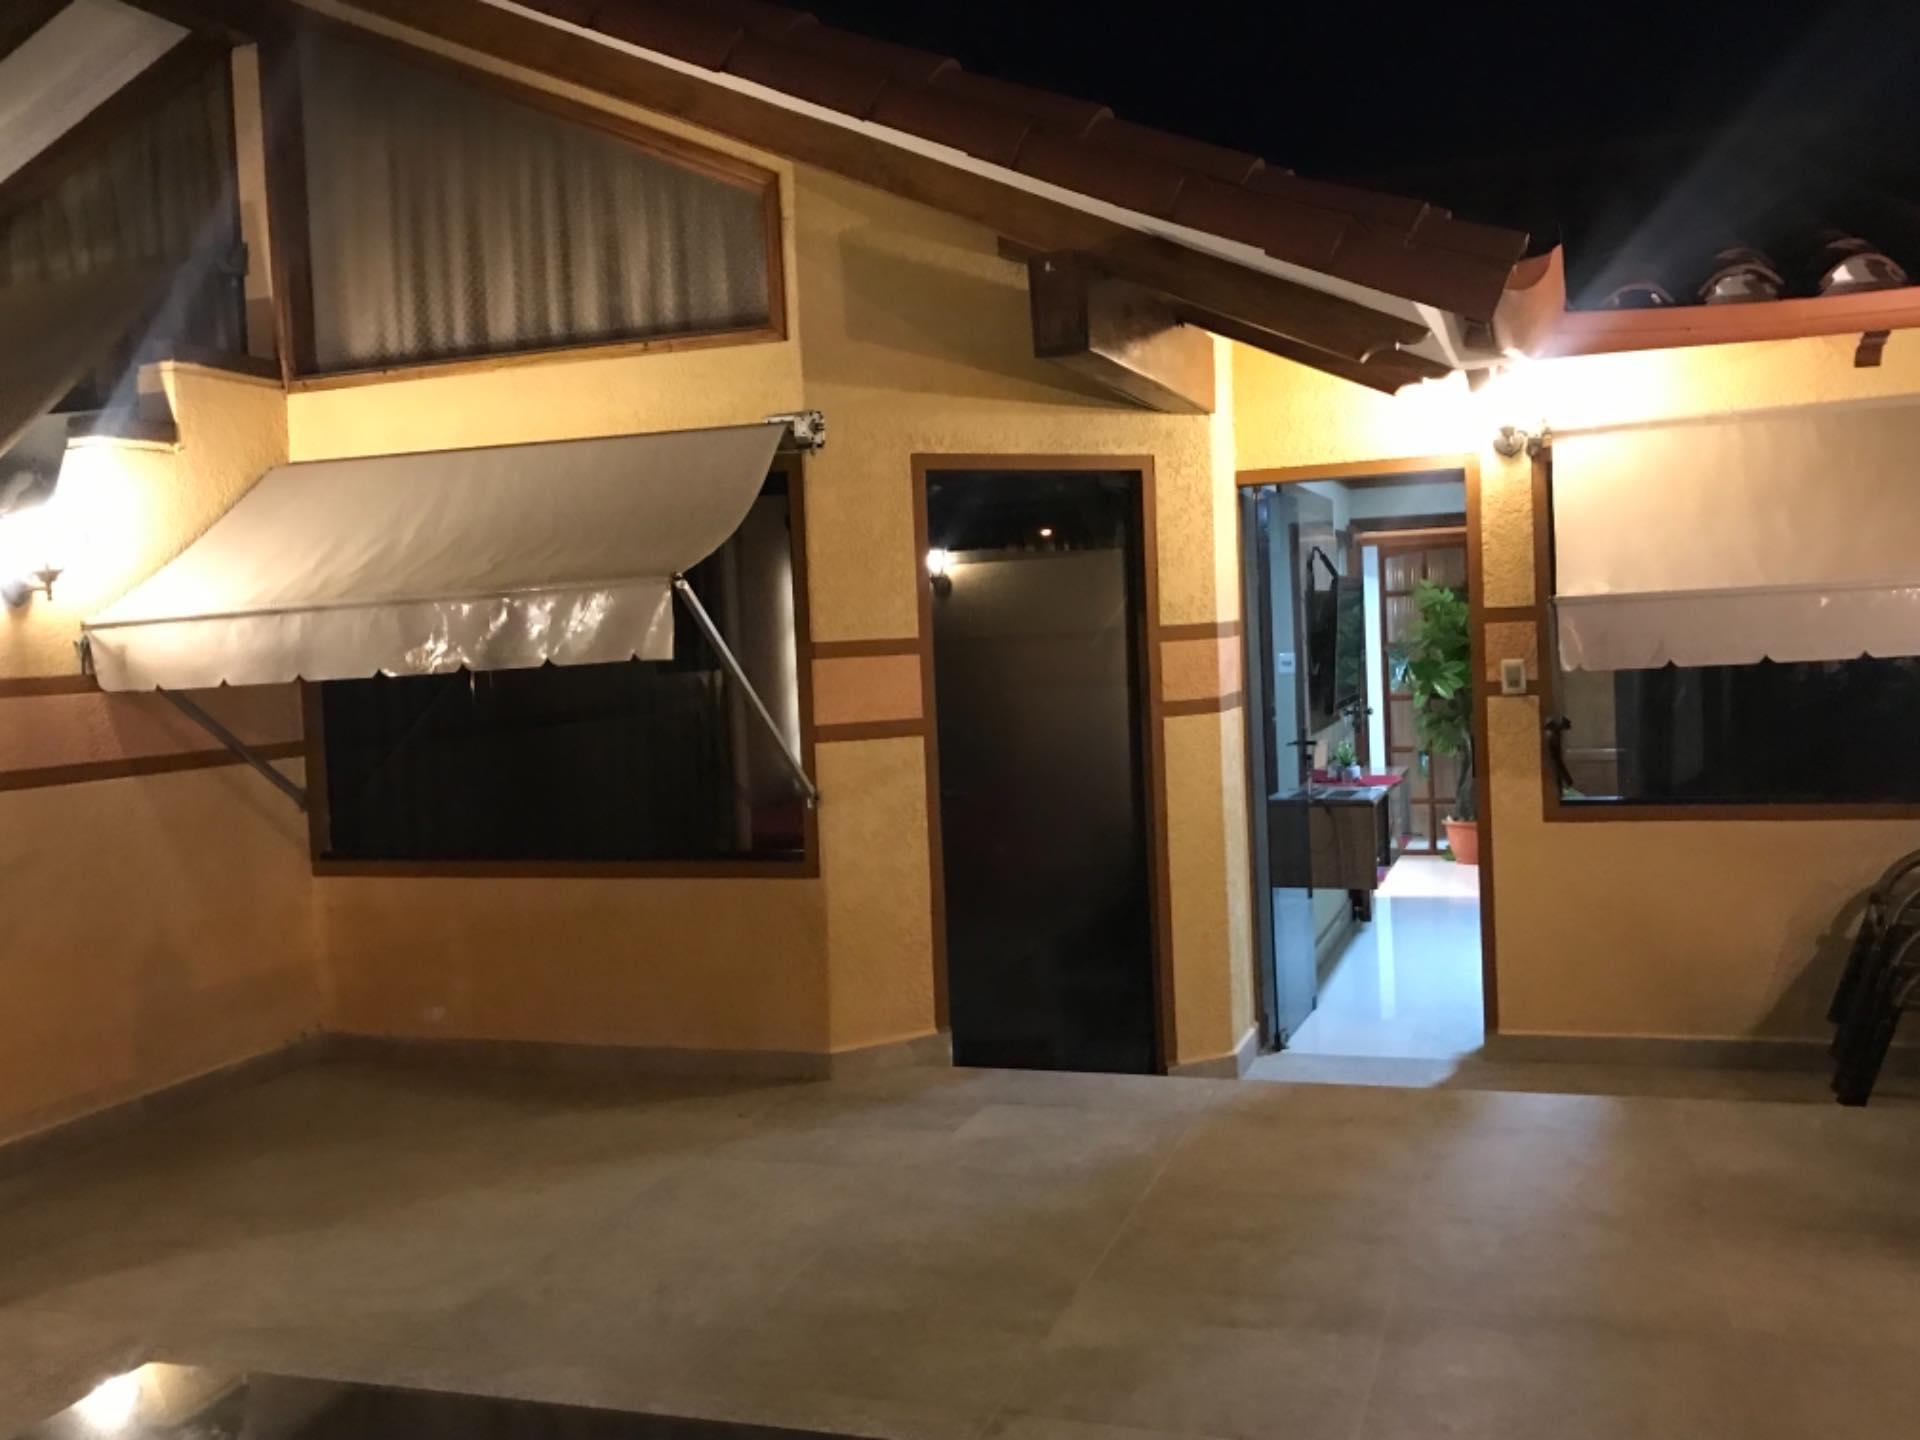 Casa en Venta Sobre avenida Santos Dumont entre 2do y 3er anilllo  Foto 12